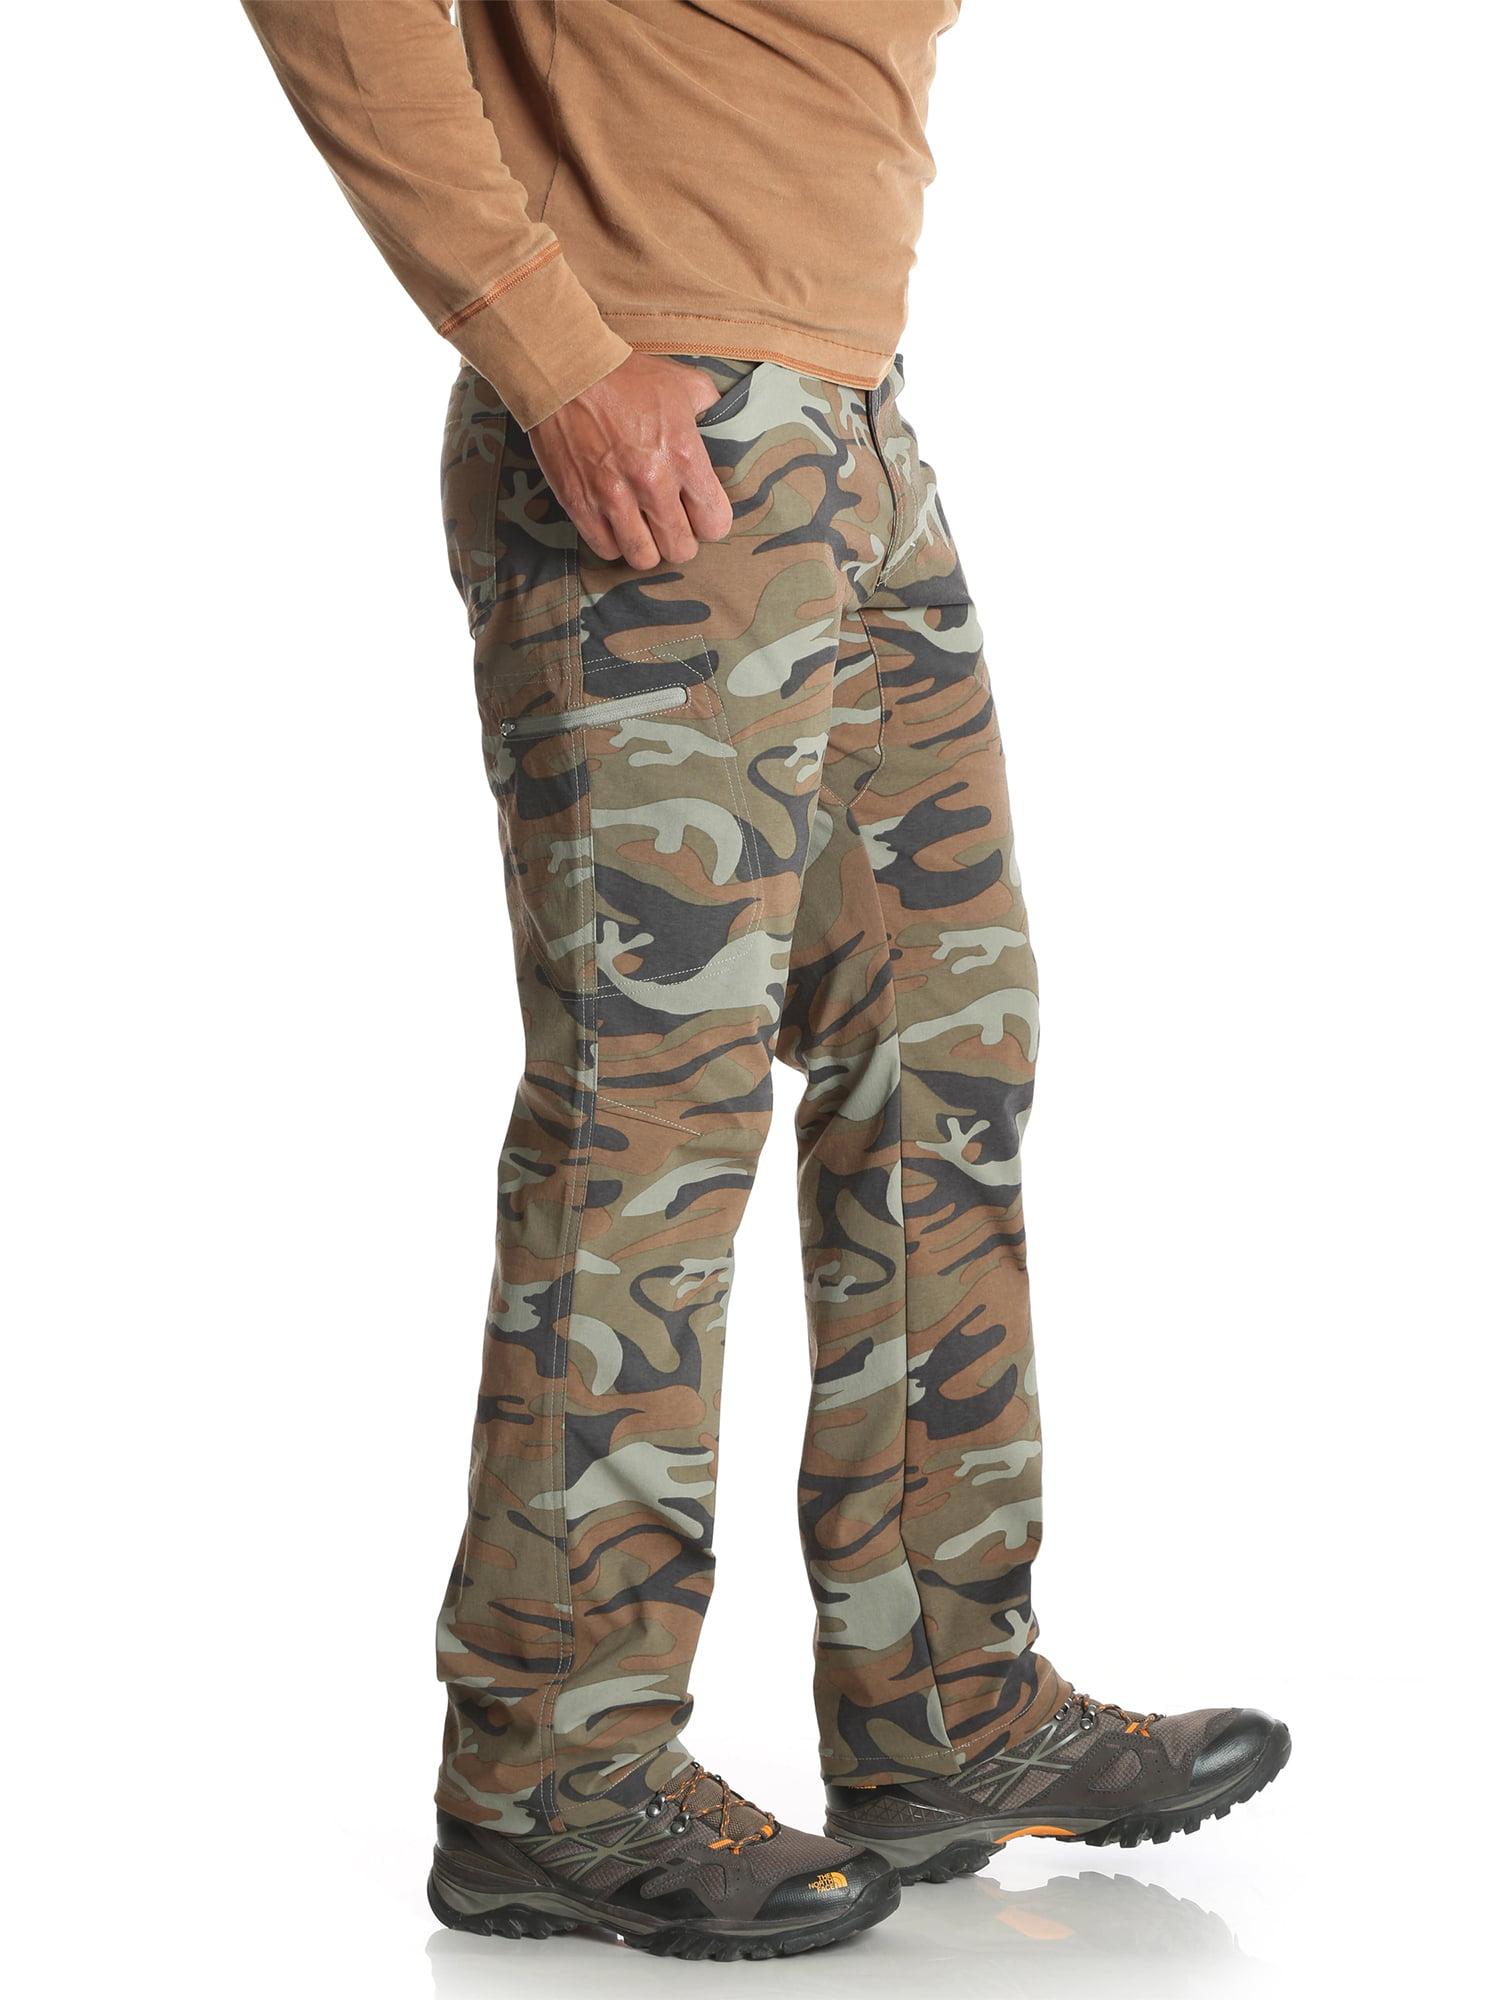 Wrangler Mens Outdoor Comfort Flex Cargo Pant Army Green, 34x30